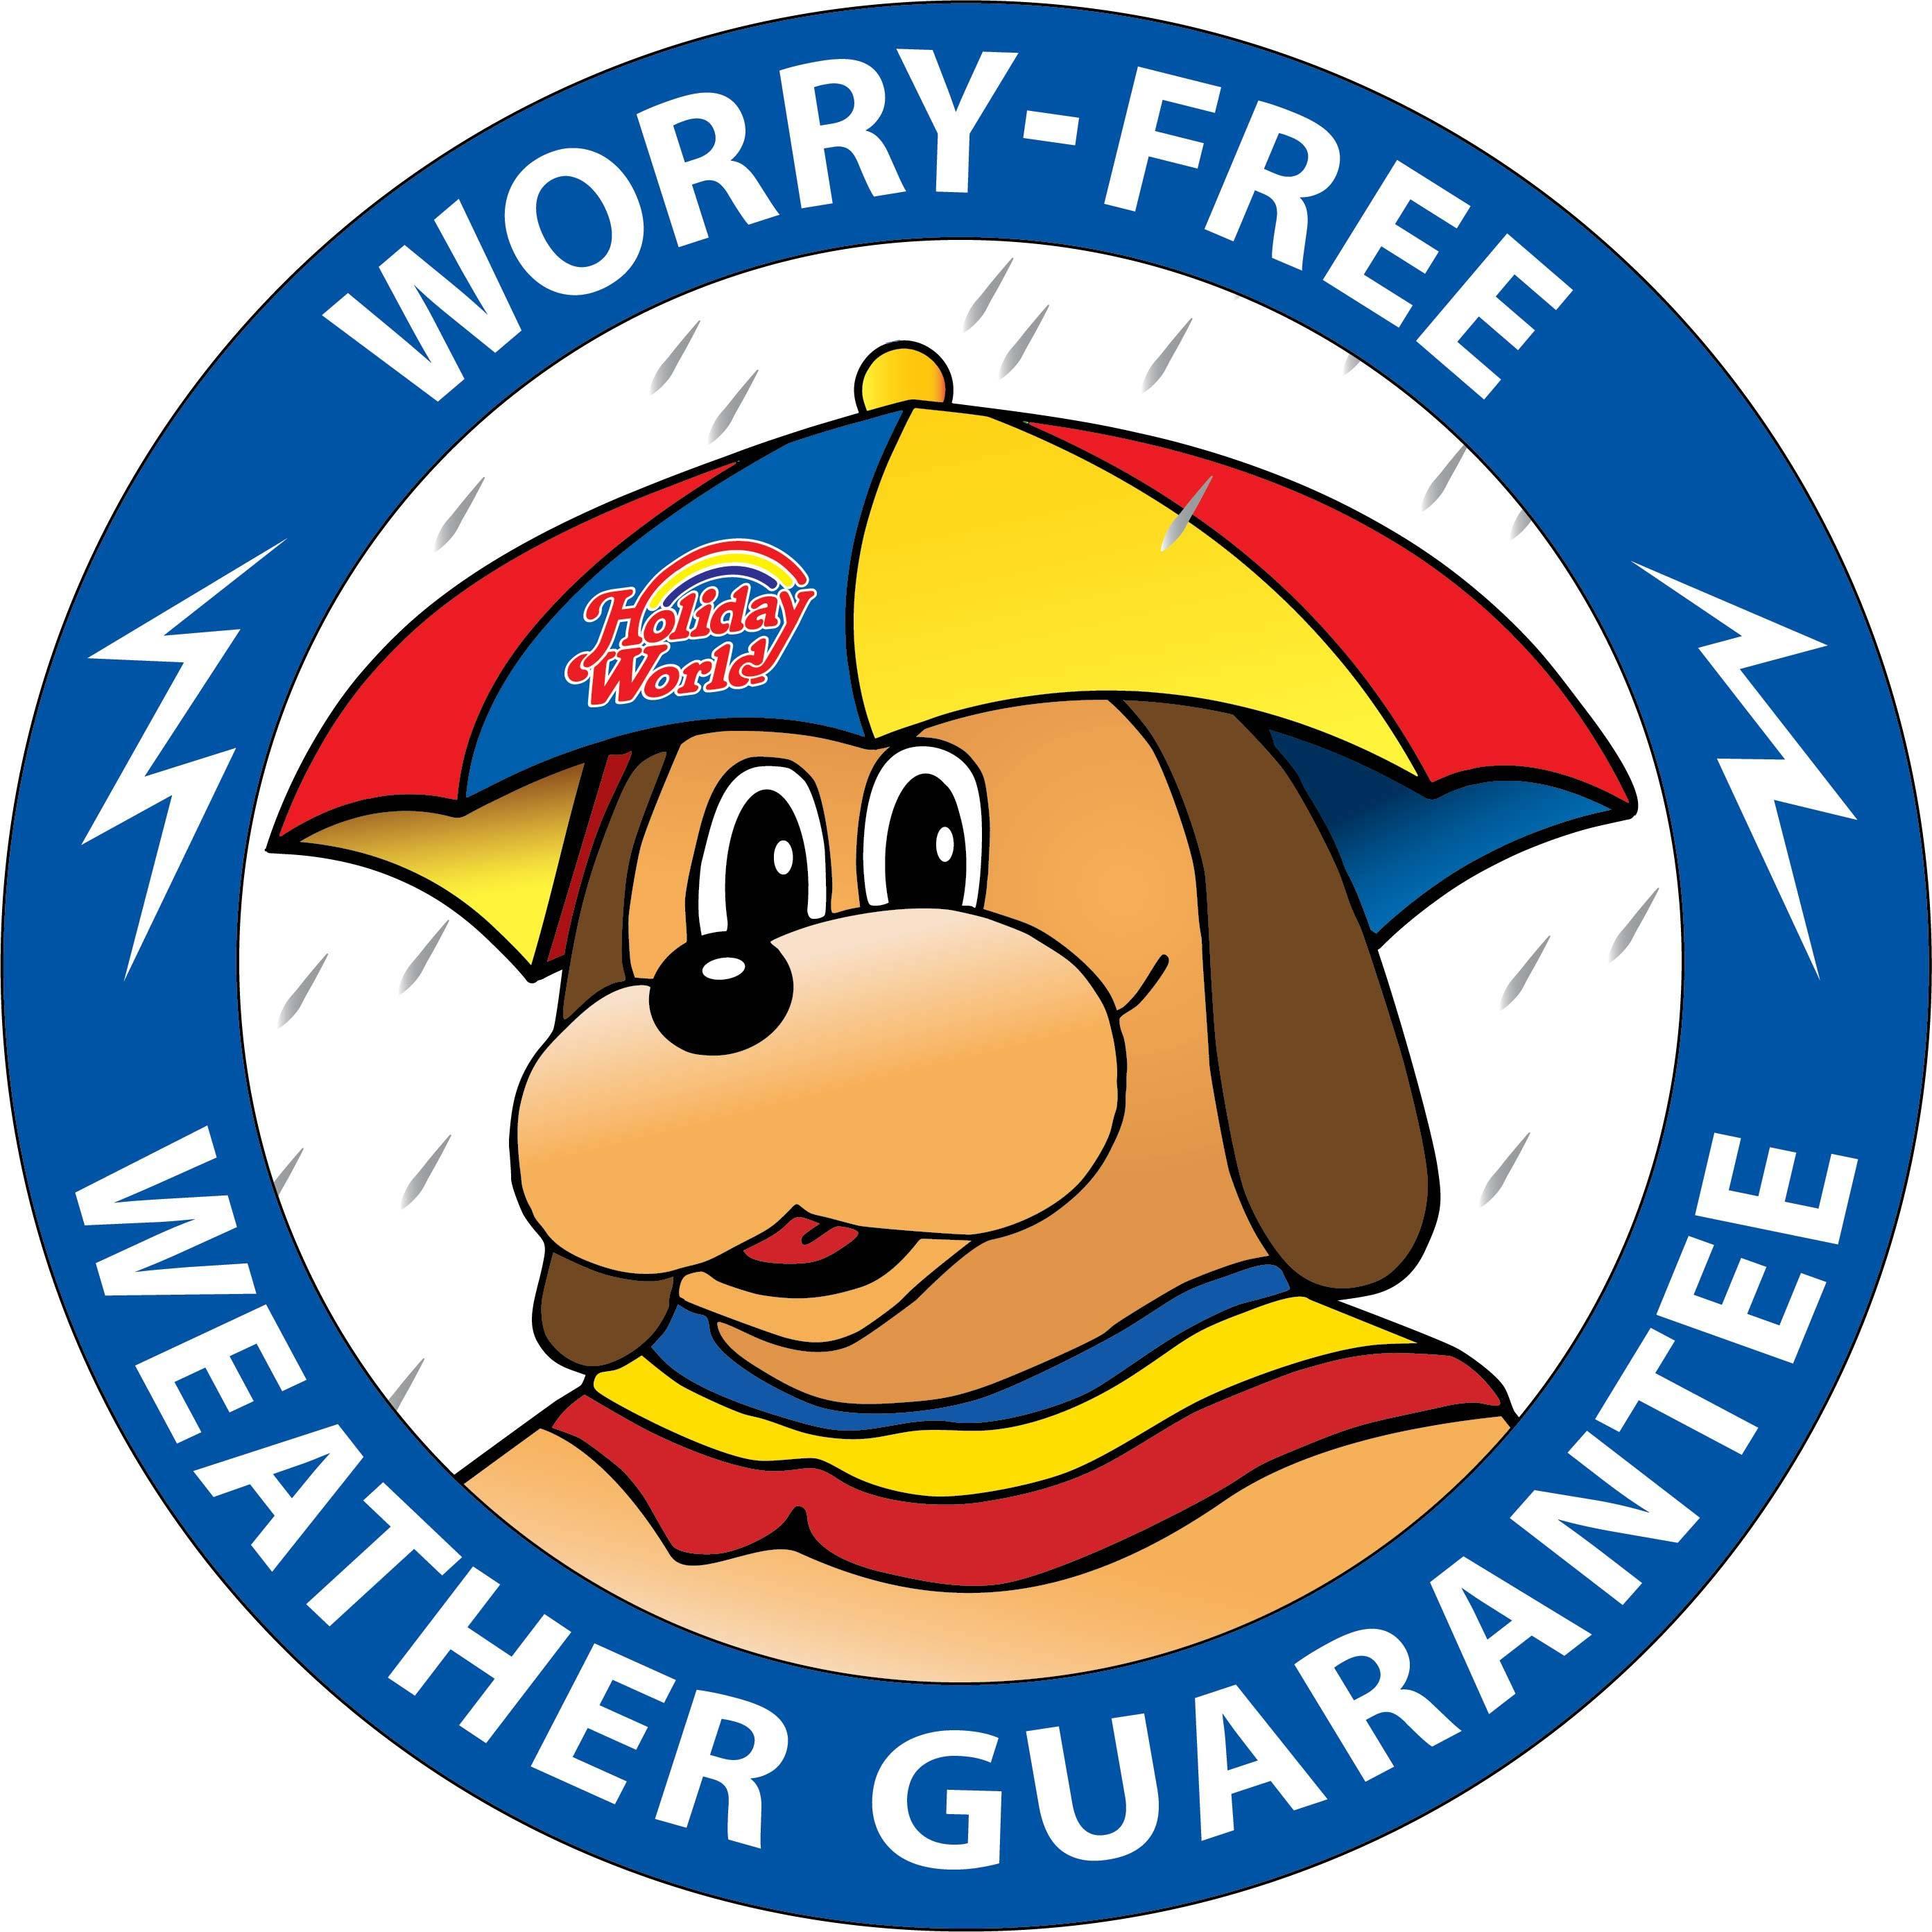 Worry-Free-Weather-Guarantee-logo.jpg